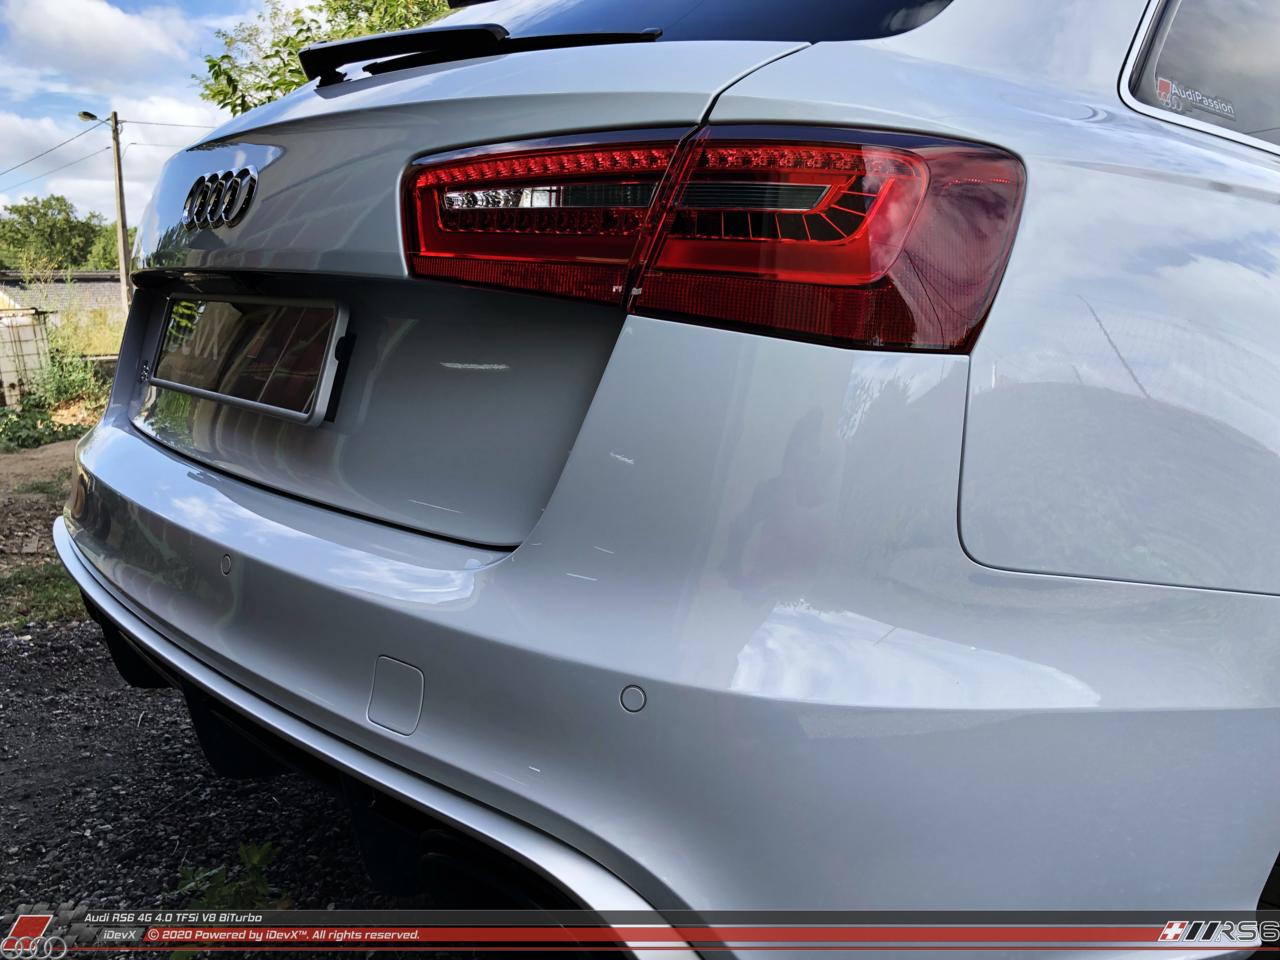 05_08.2019_Audi-RS6_iDevX_048.png